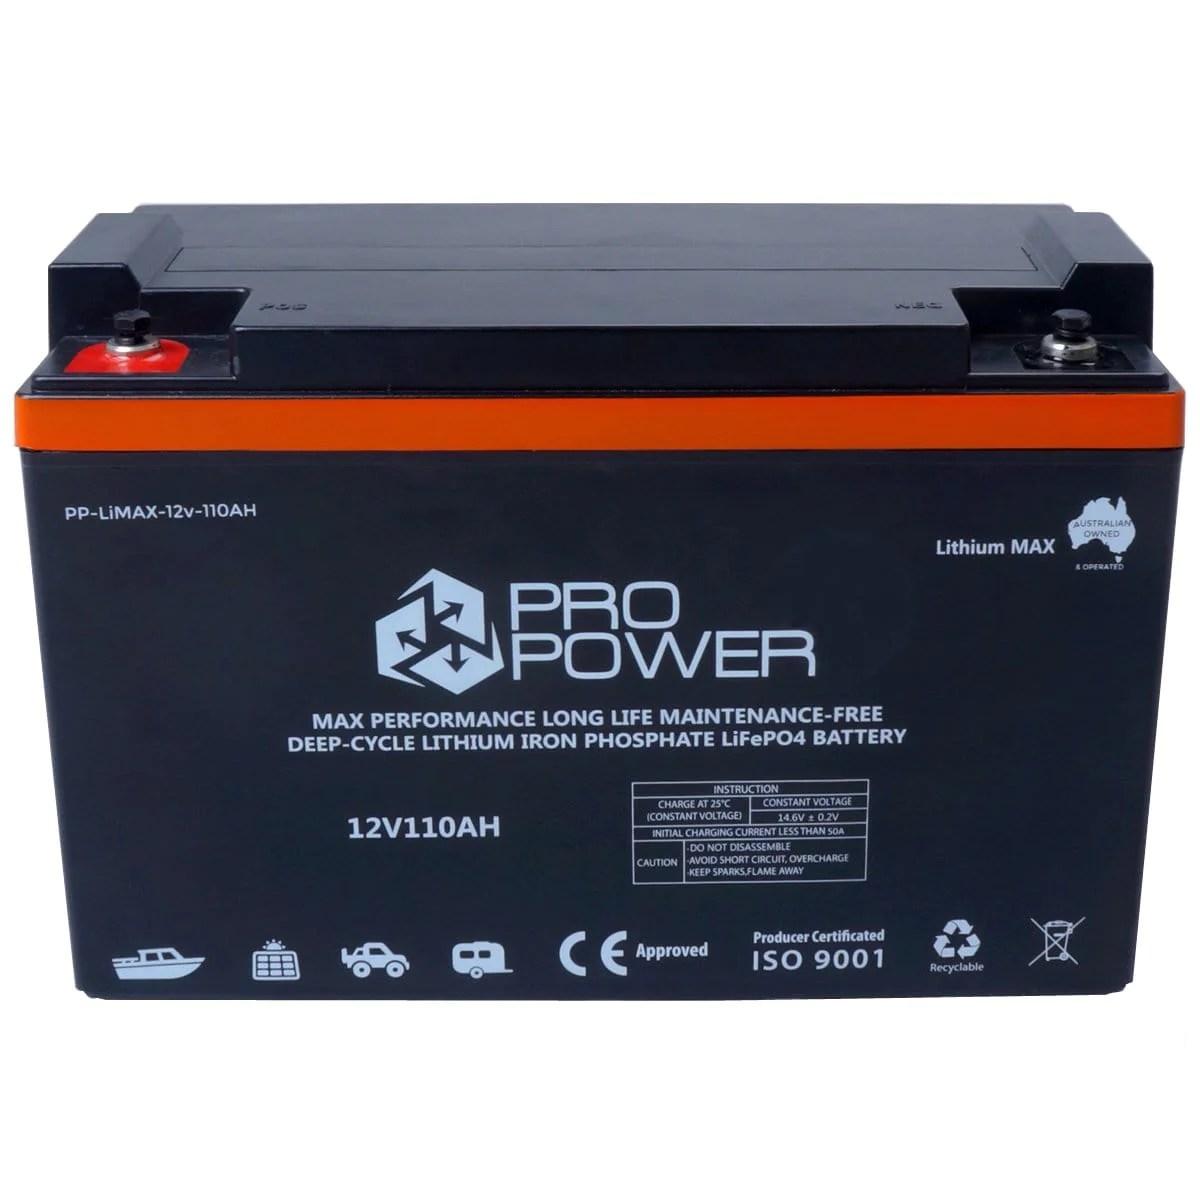 small resolution of pro power 12v 110ah lithium iron lifepo4 deep cycle battery solar 4wd caravan